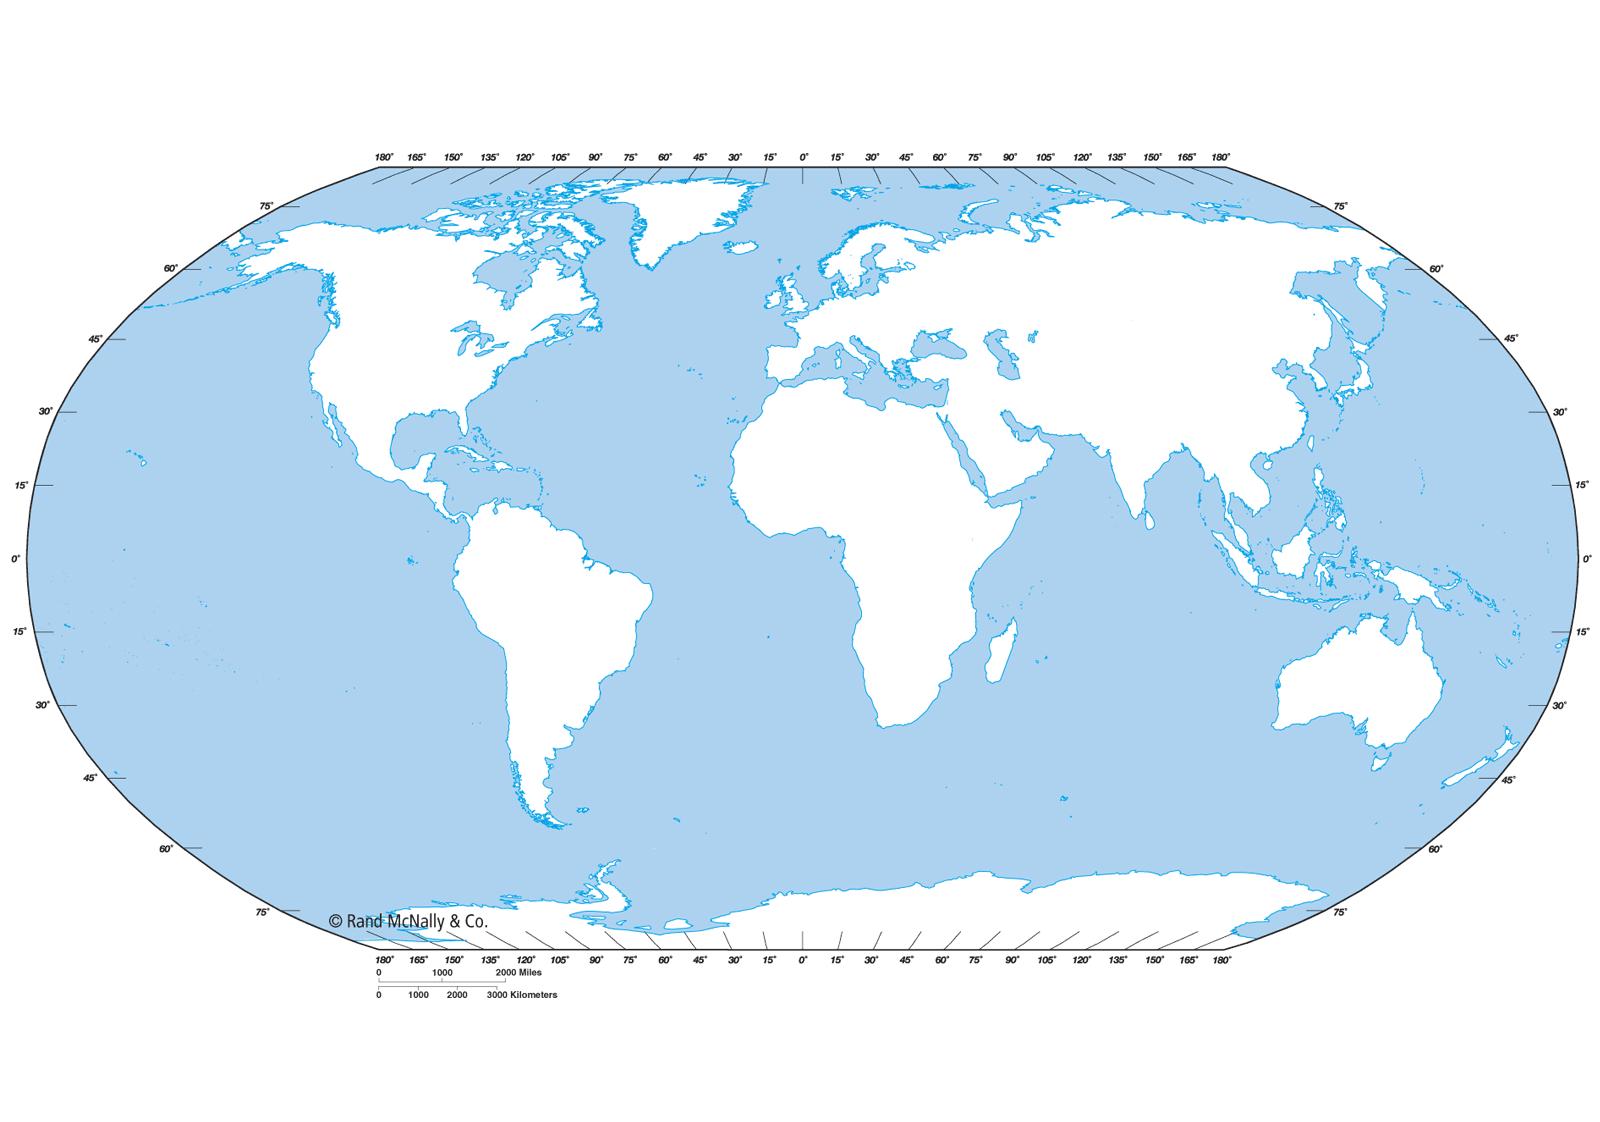 Mapa Mundo de Contorno Outline | Mapa del Mundo